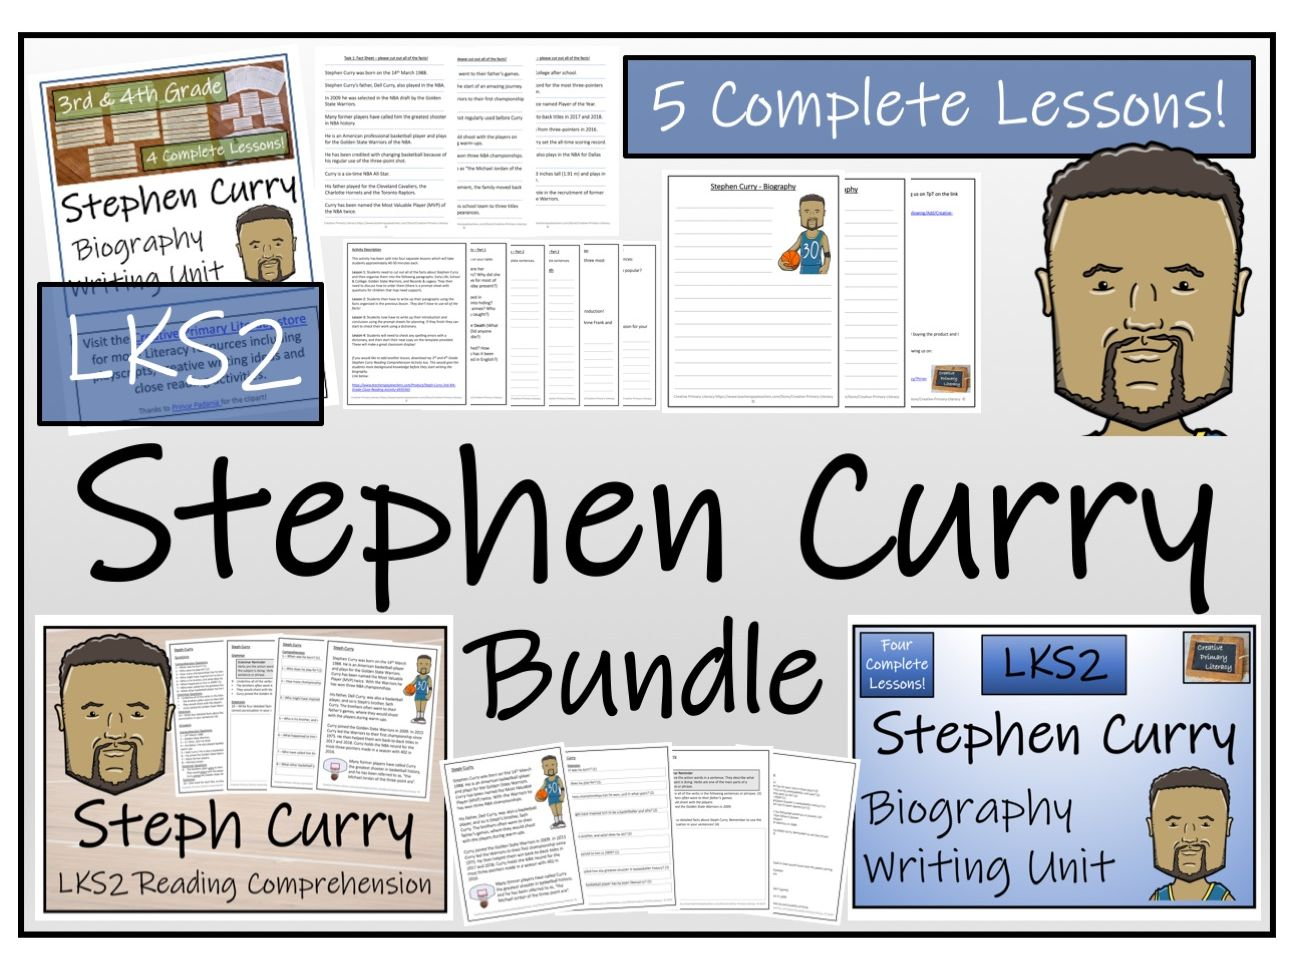 LKS2 Literacy - Stephen Curry Reading Comprehension & Biography Bundle